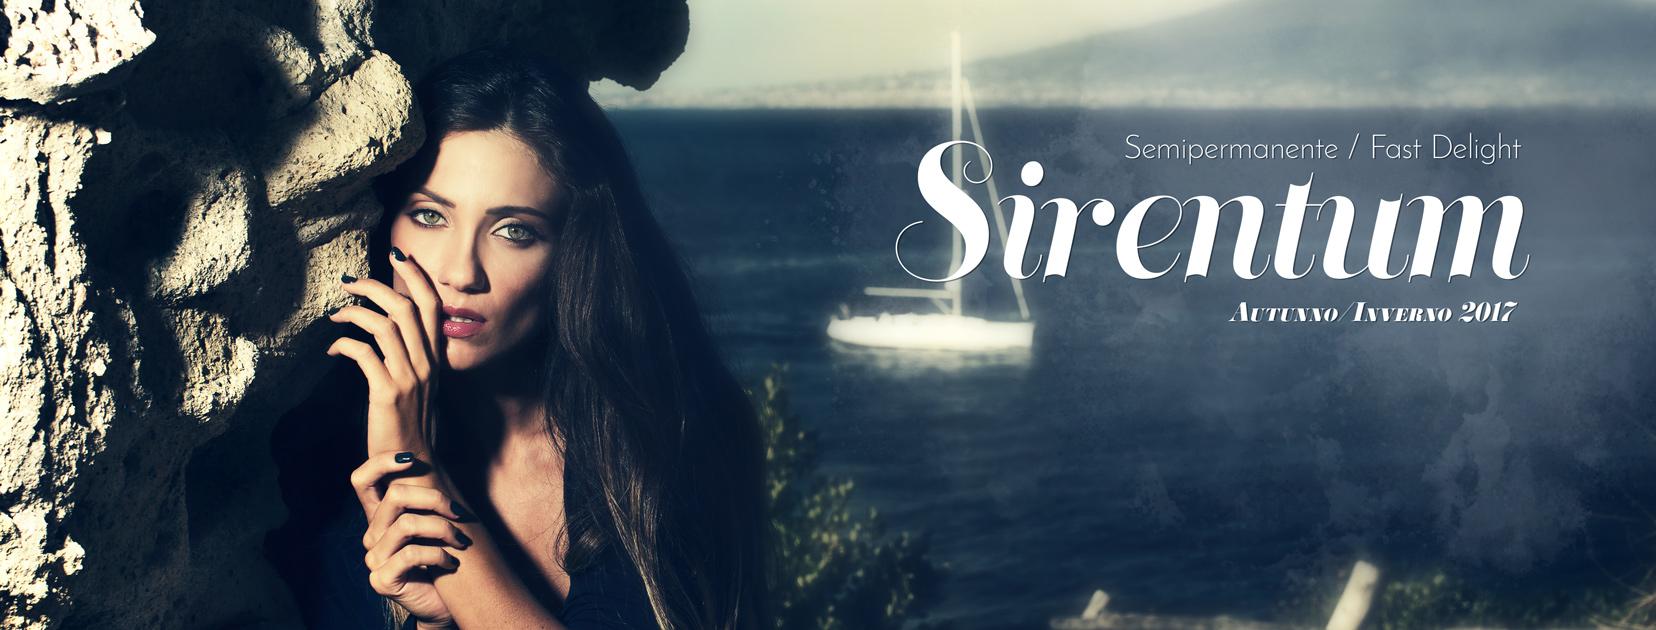 Cover-Siremtum.jpg